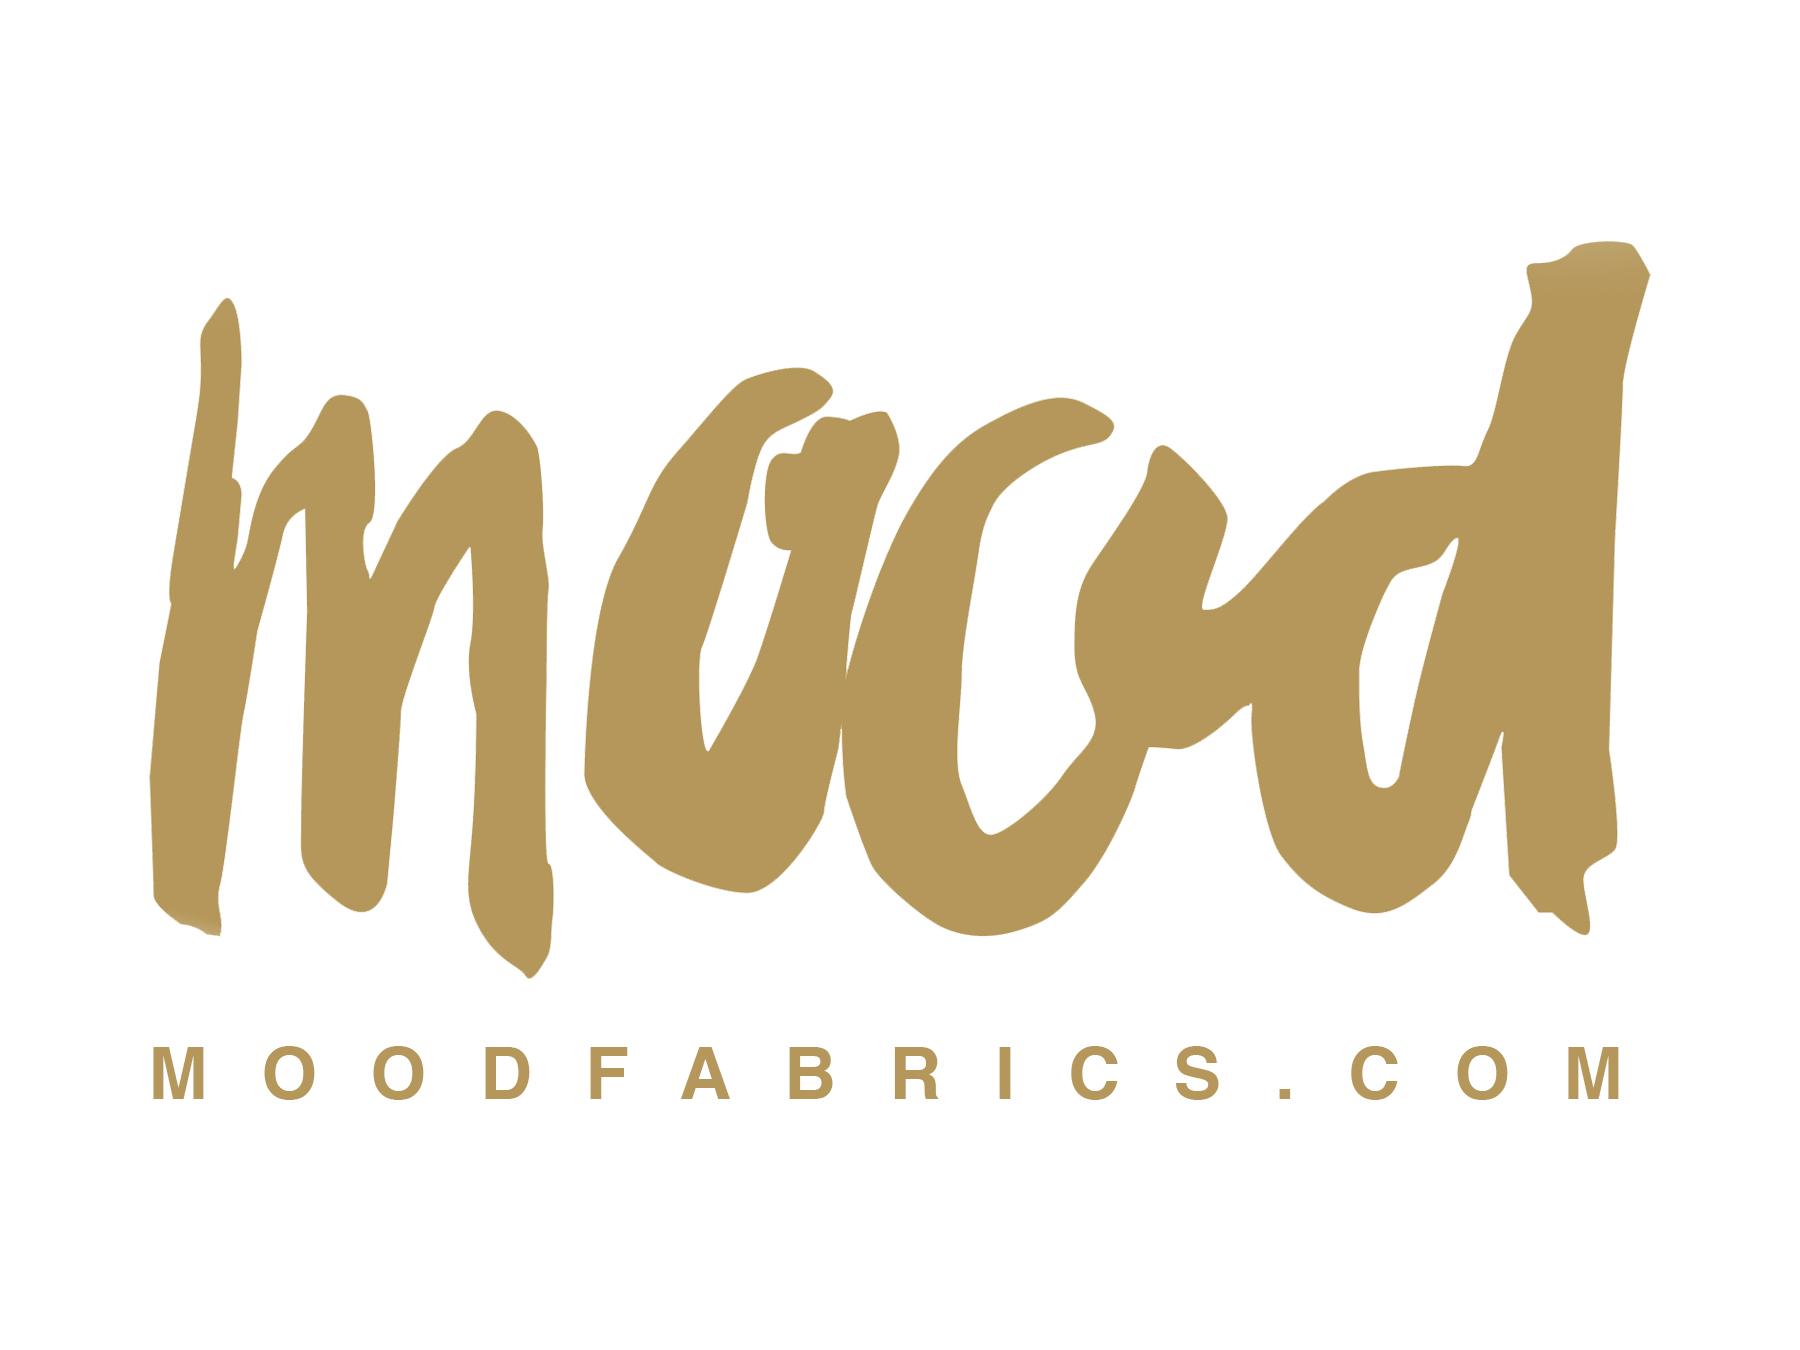 moodFabrics Logo - moodfabrics.com